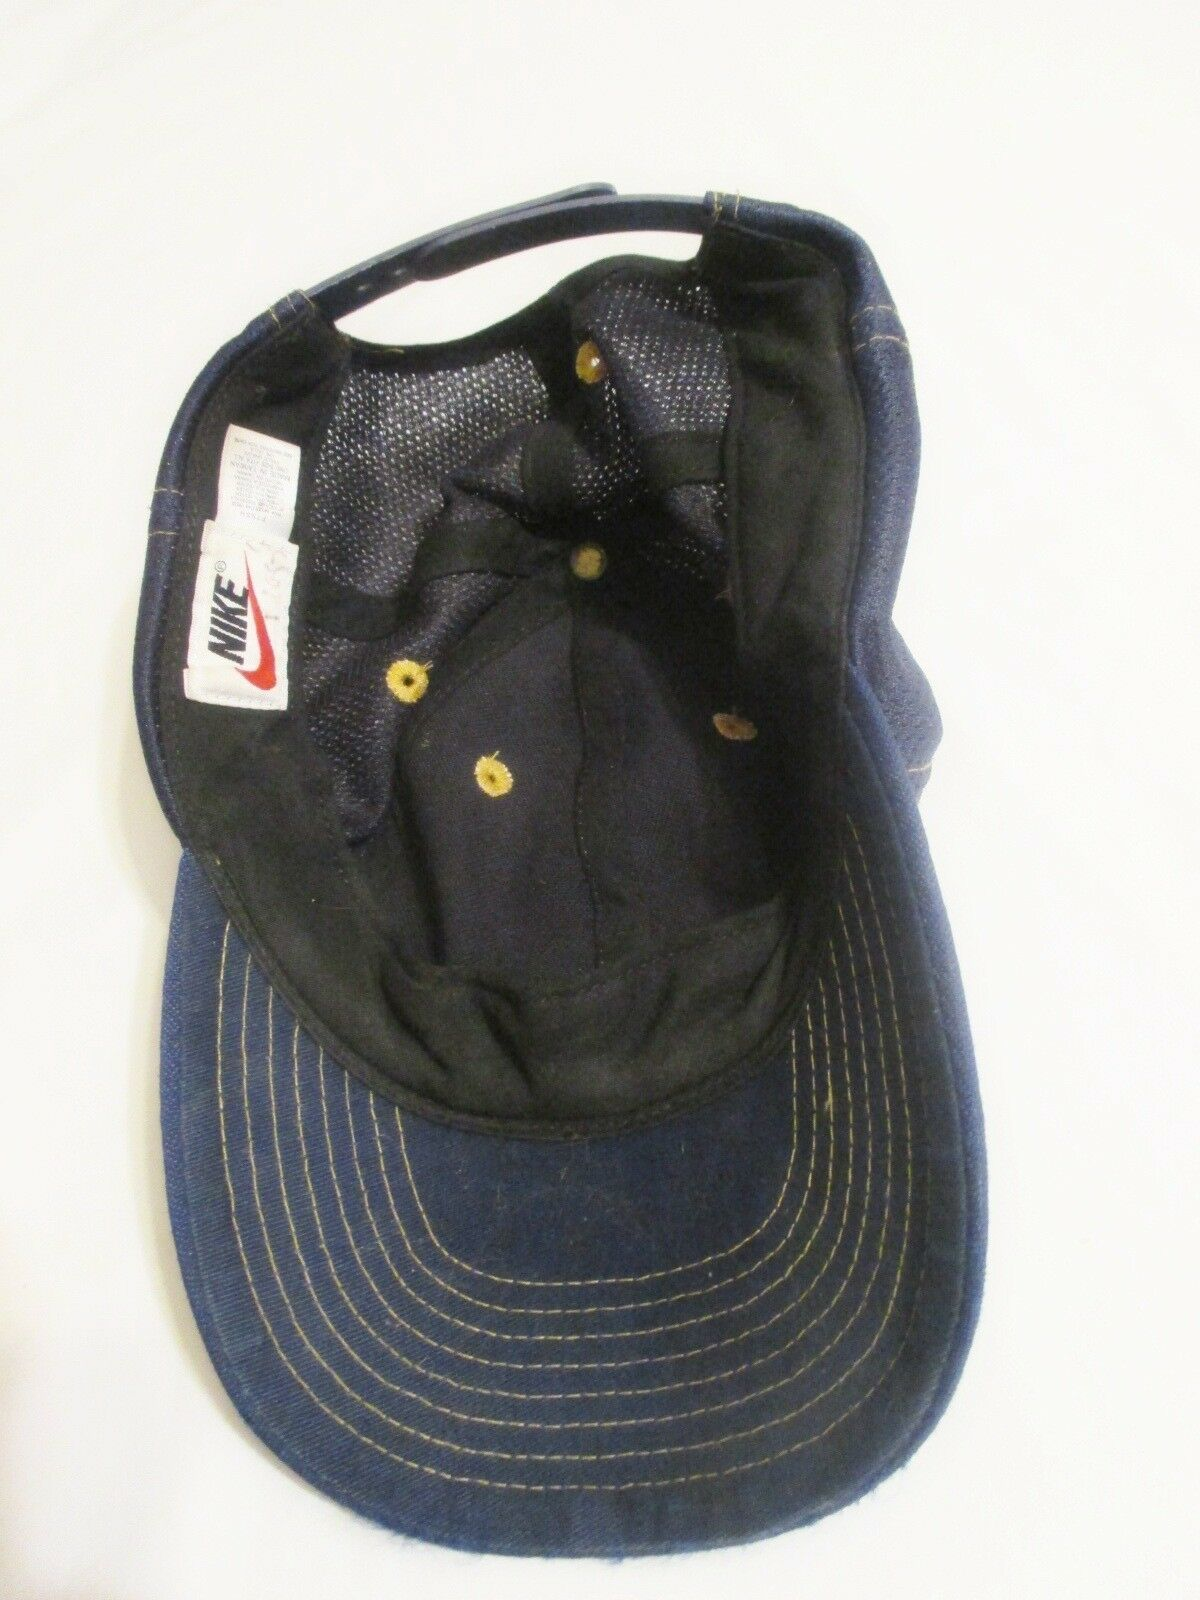 NIKE Vintage Baseball Cap/Hat One Size Snapback Maize/Blue Running, Fishing